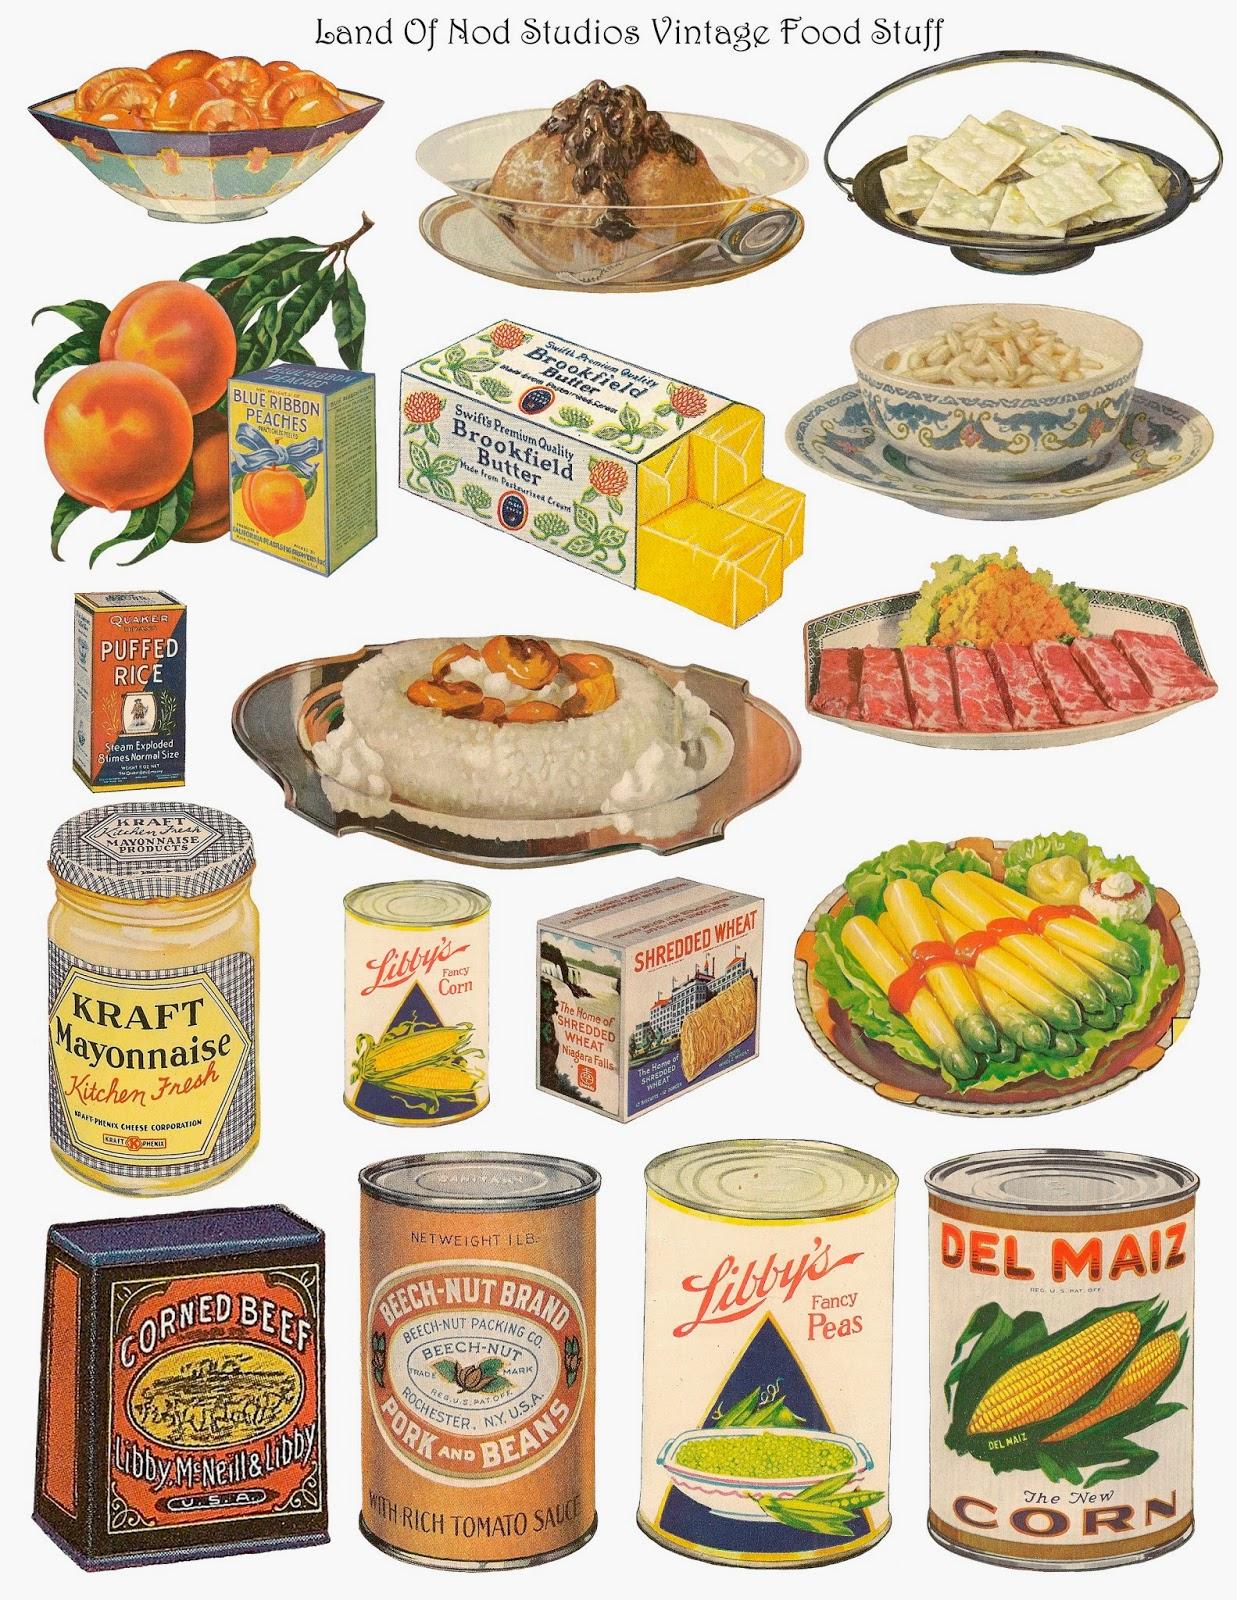 http://1.bp.blogspot.com/-VOur329IxPY/VCWMvgtvdzI/AAAAAAAAEqs/8HHyJbZfzas/s1600/foodstuffLON%2Bcopy.jpg